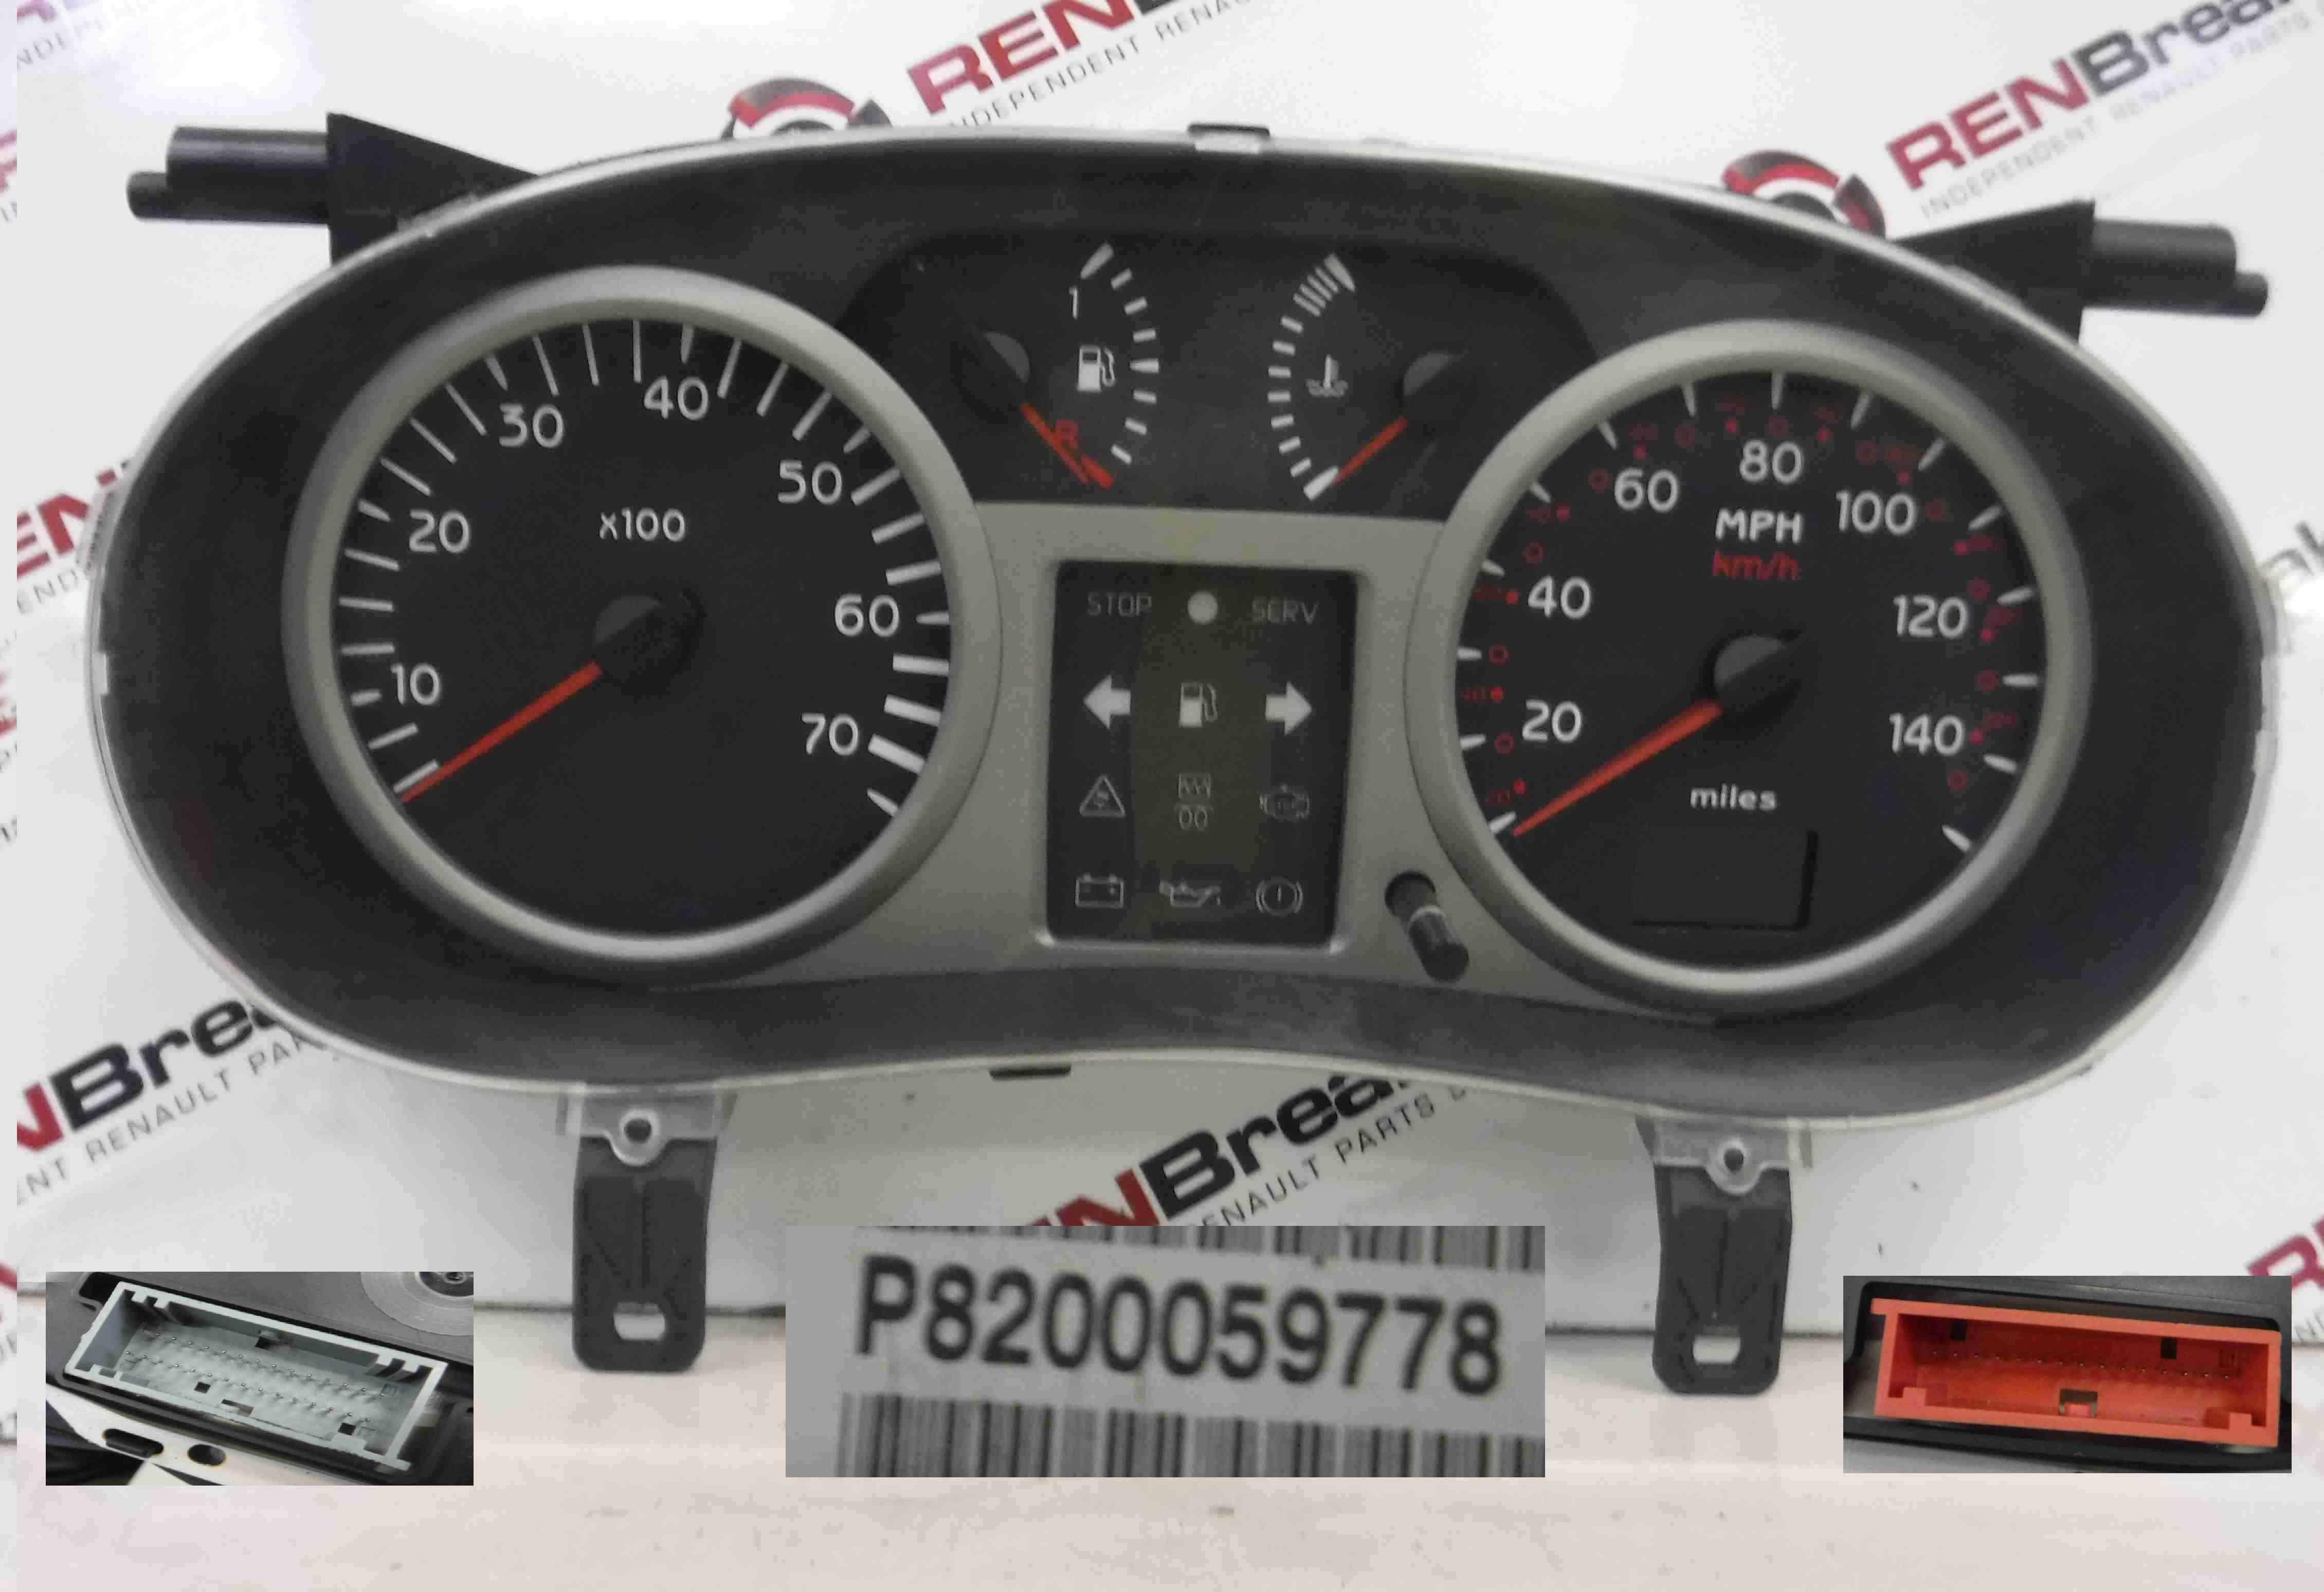 Renault Clio MK2 2001-2006 Instrument Panel Dials Gauges Clocks 143K 8200059778